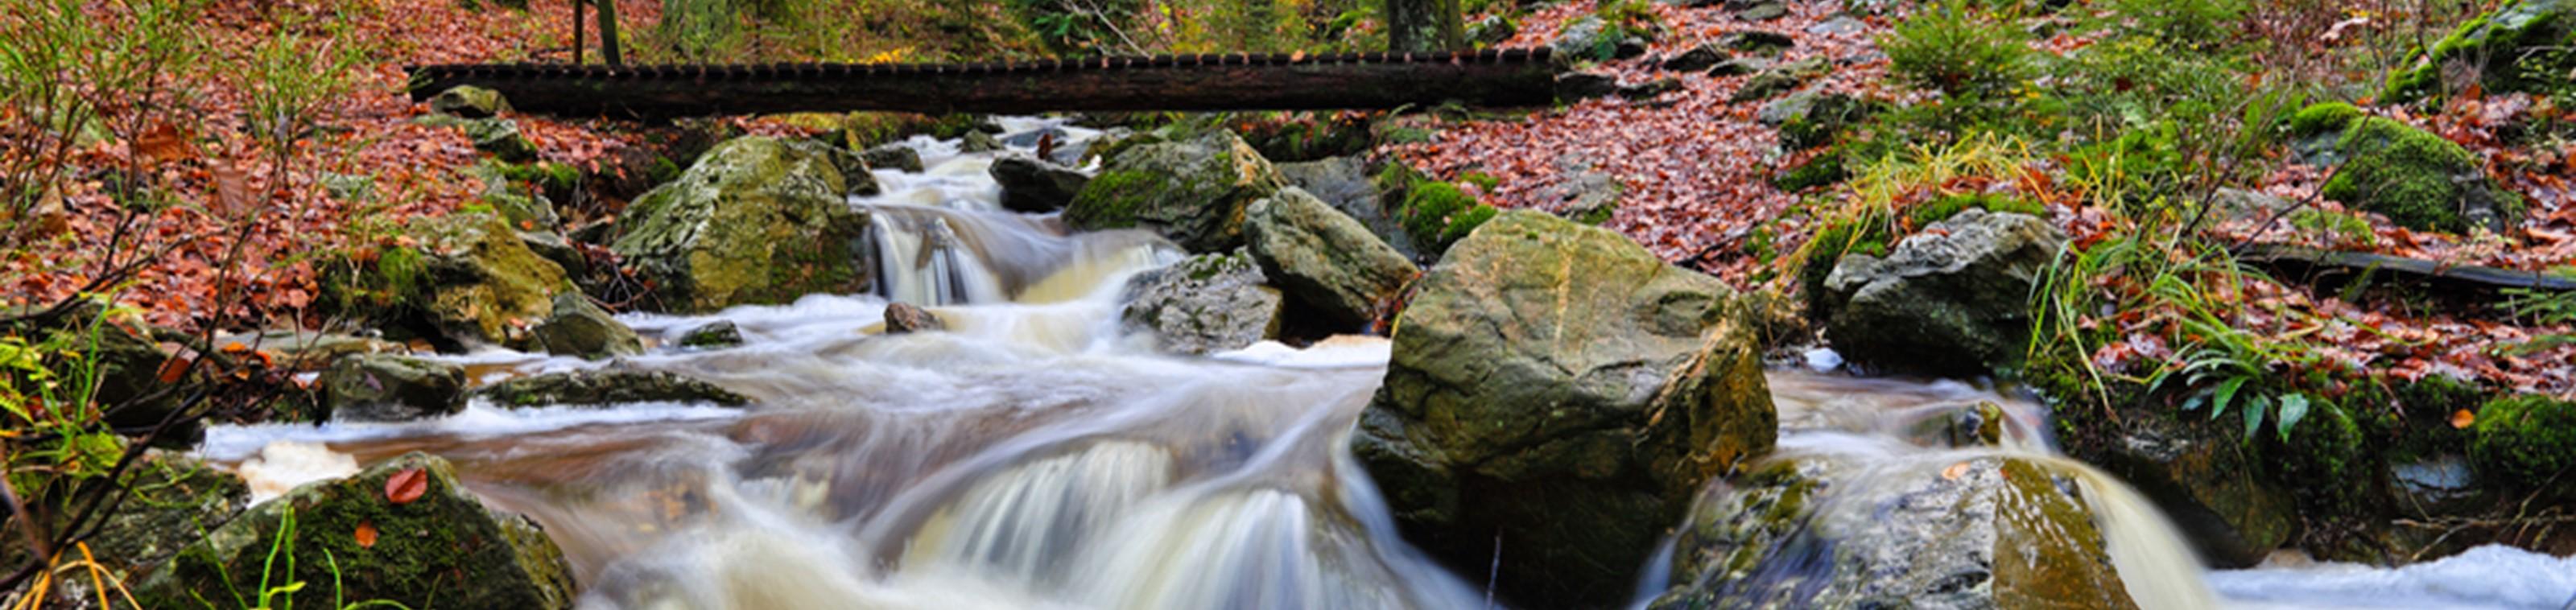 Natuur in de Ardennen: Hotel Le Val de Poix